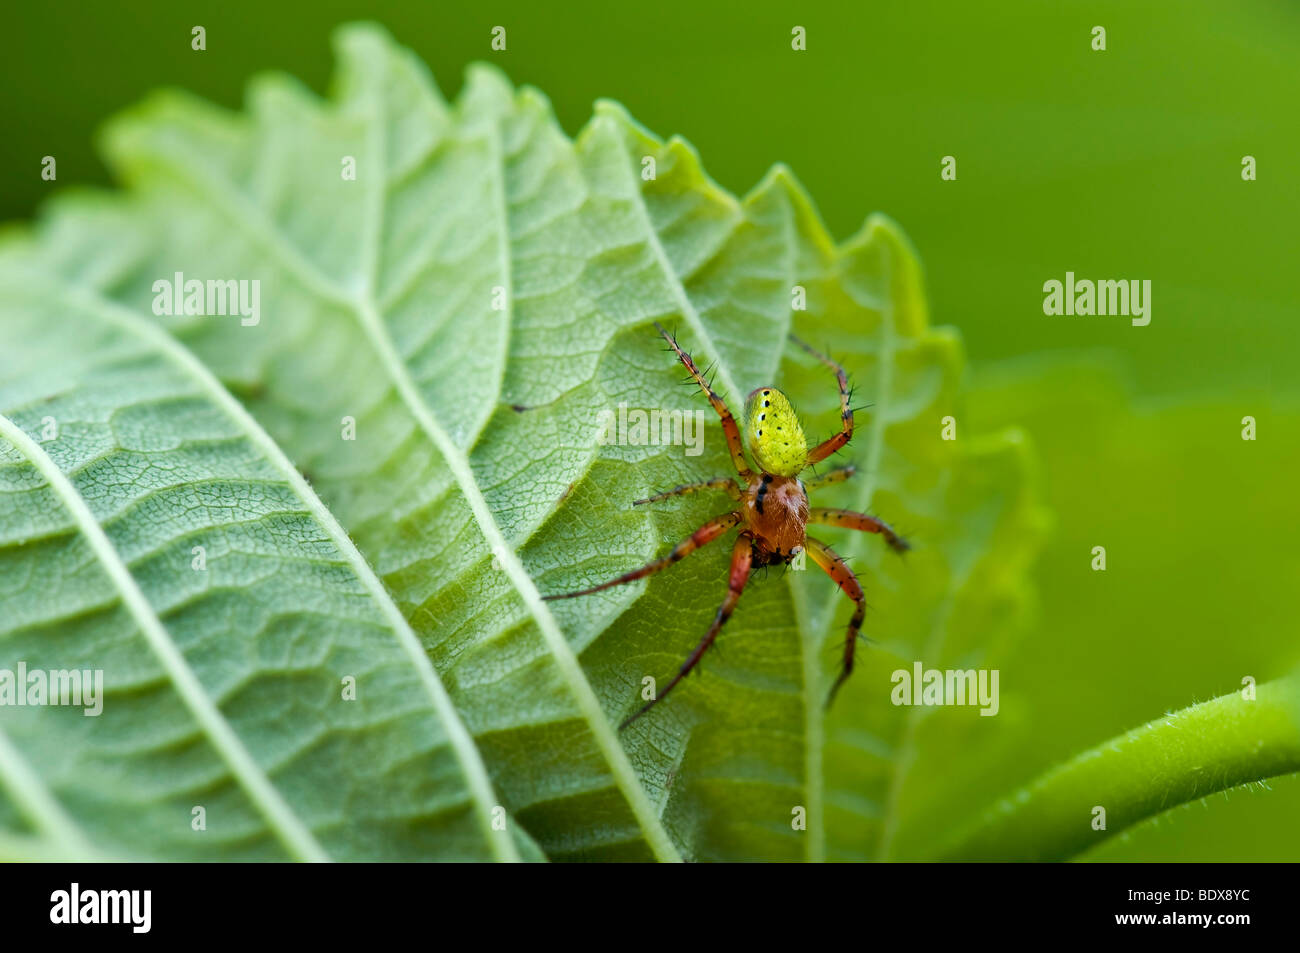 Cucumber green spider (Araniella cucurbitina) - Stock Image